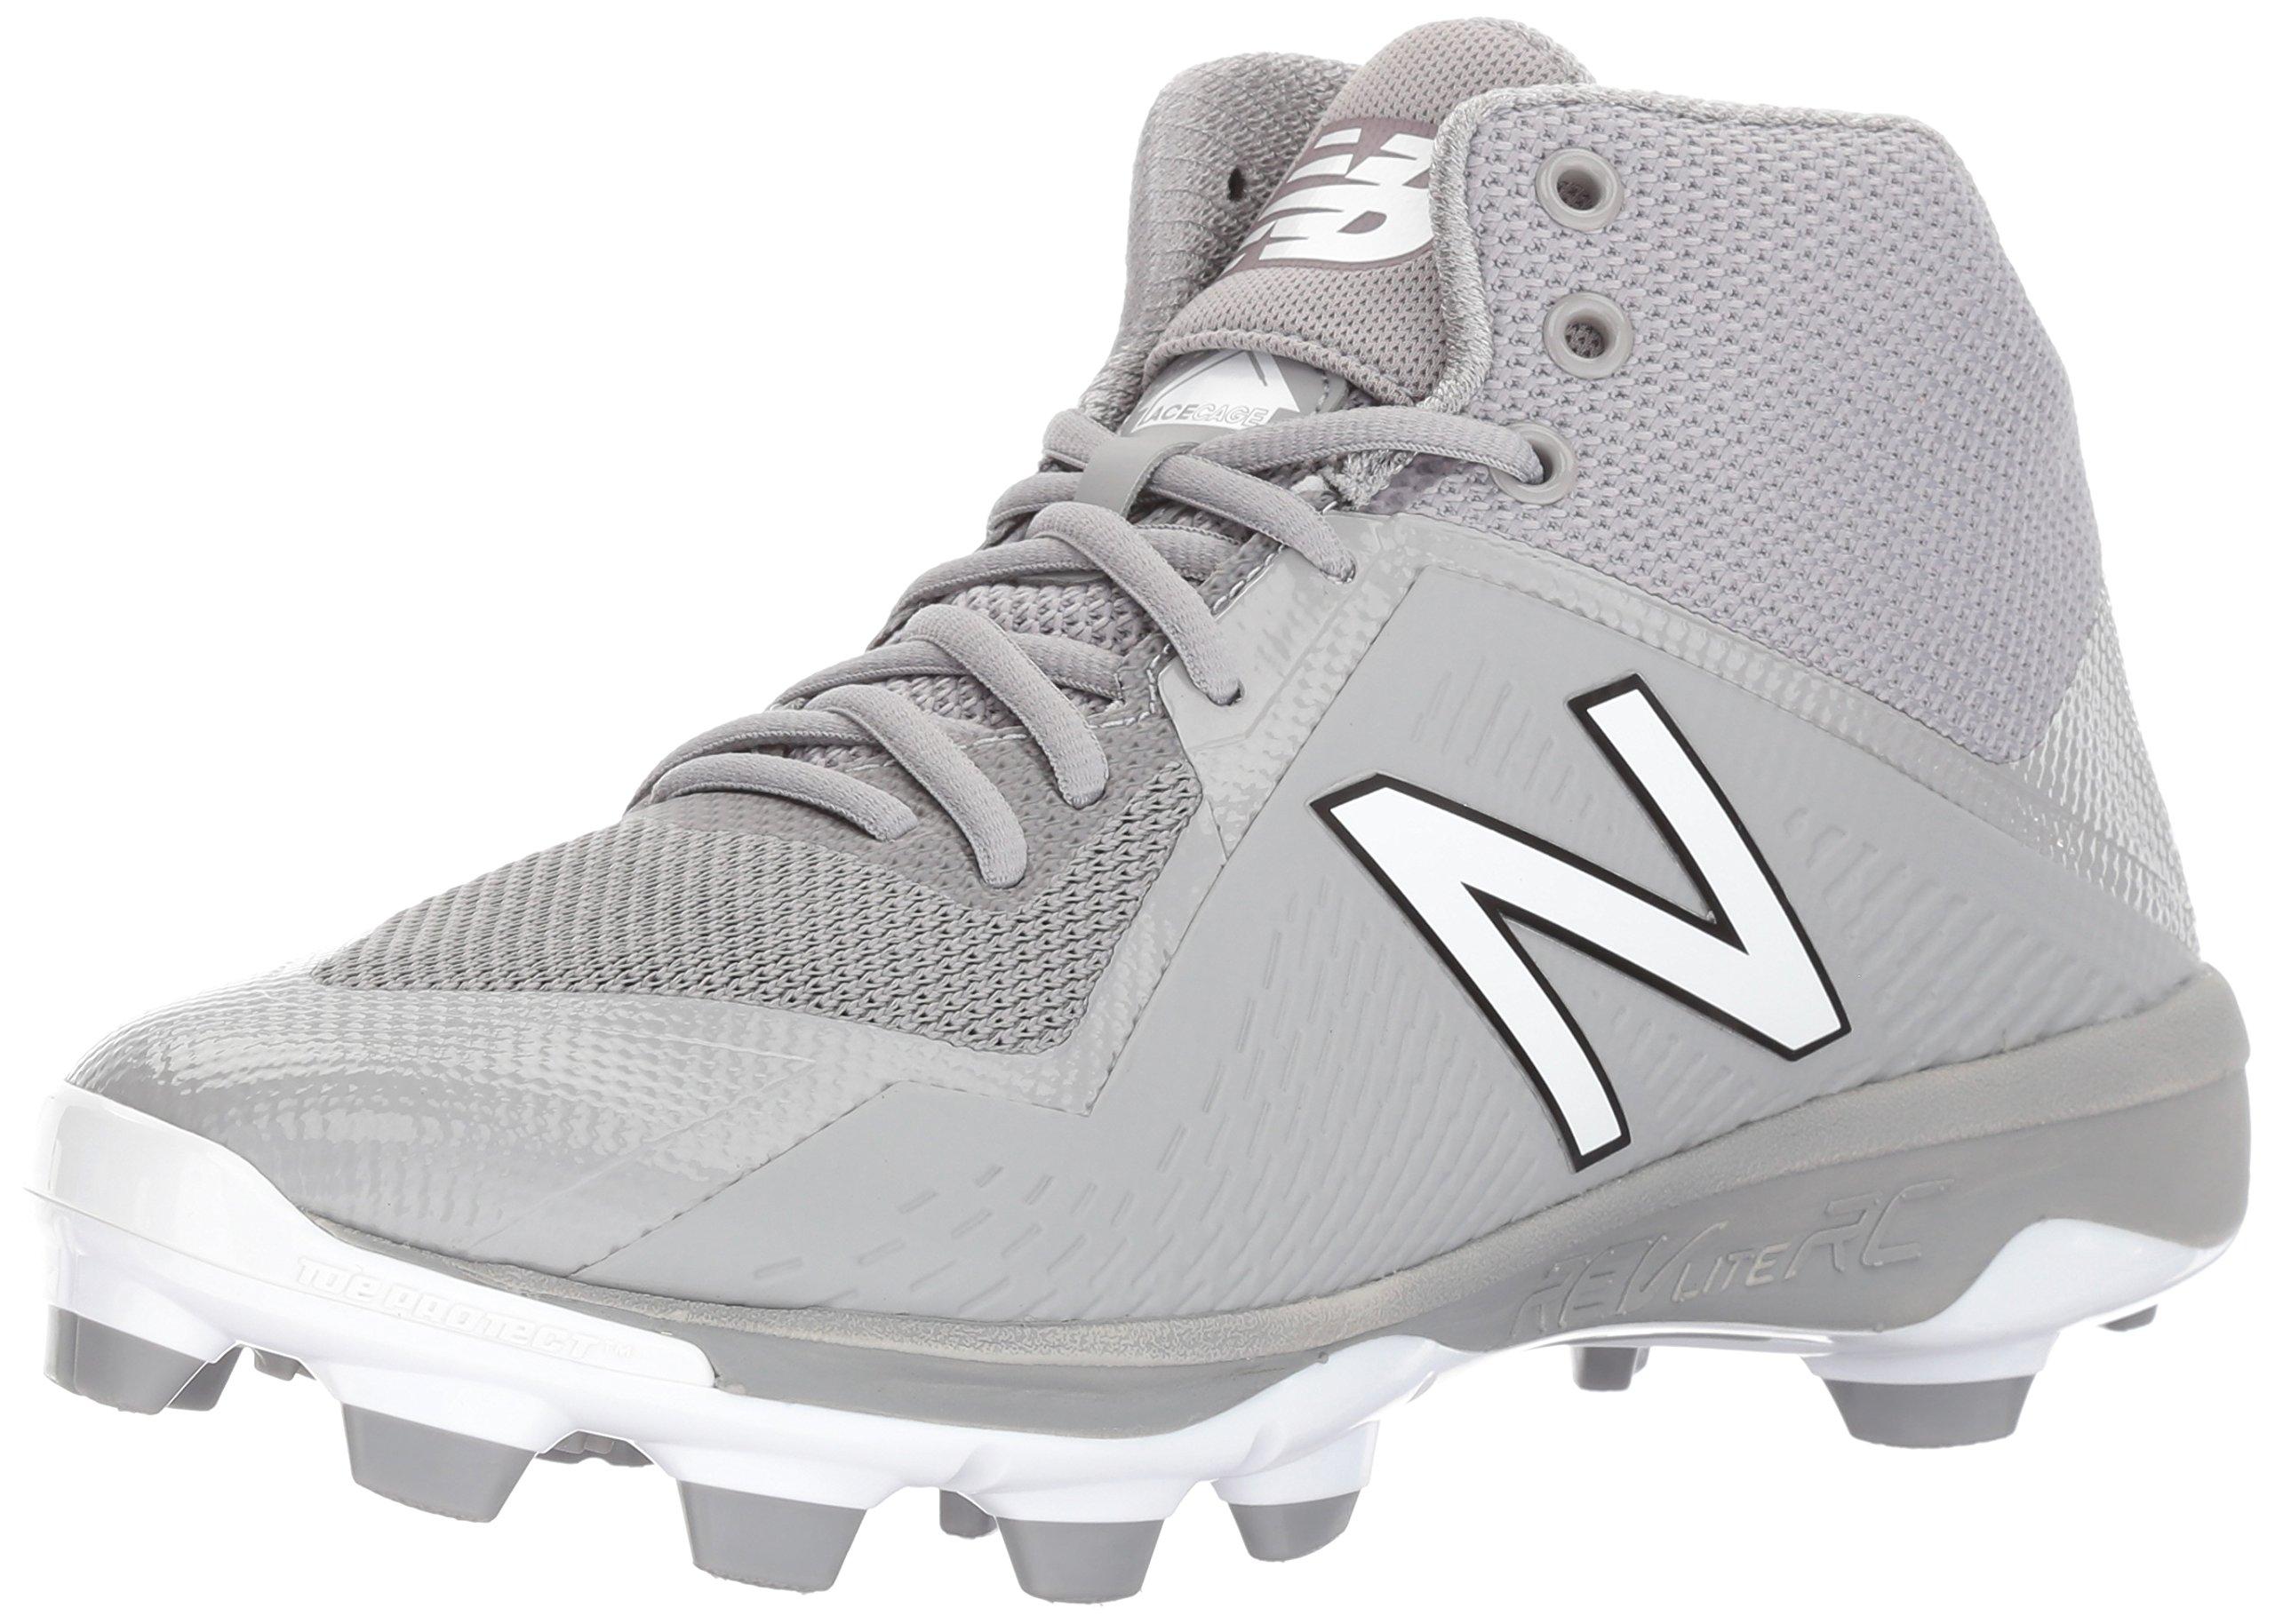 New Balance Men's PM4040v4 Molded Baseball Shoe, Grey, 15 D US by New Balance